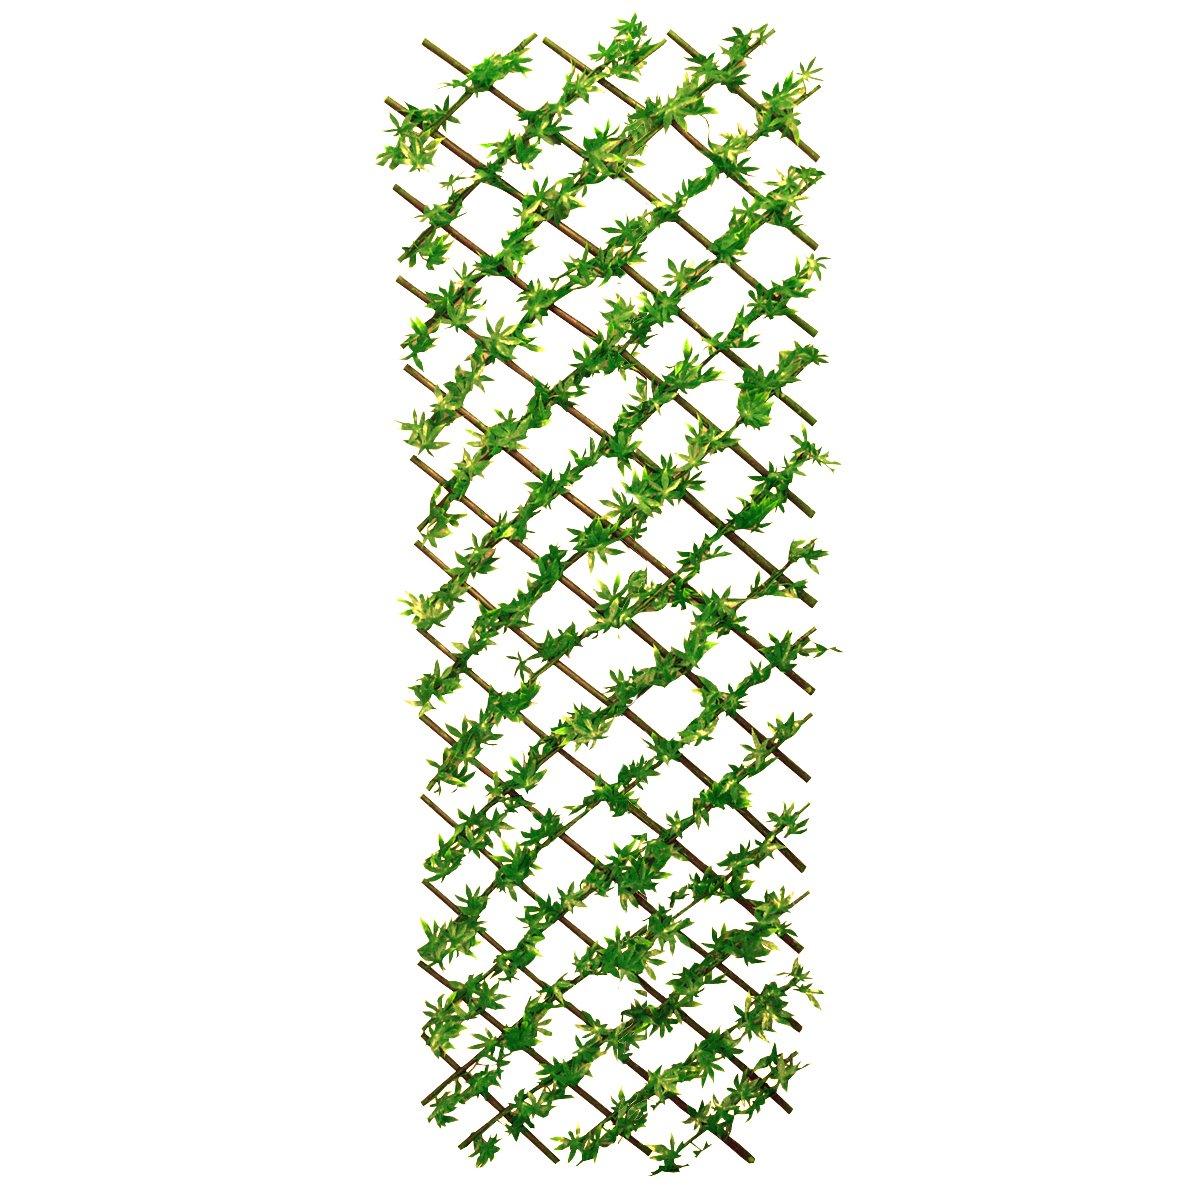 Selections Green Japanese Maple Artificial Garden Trellis (1.8m X 0.6m)